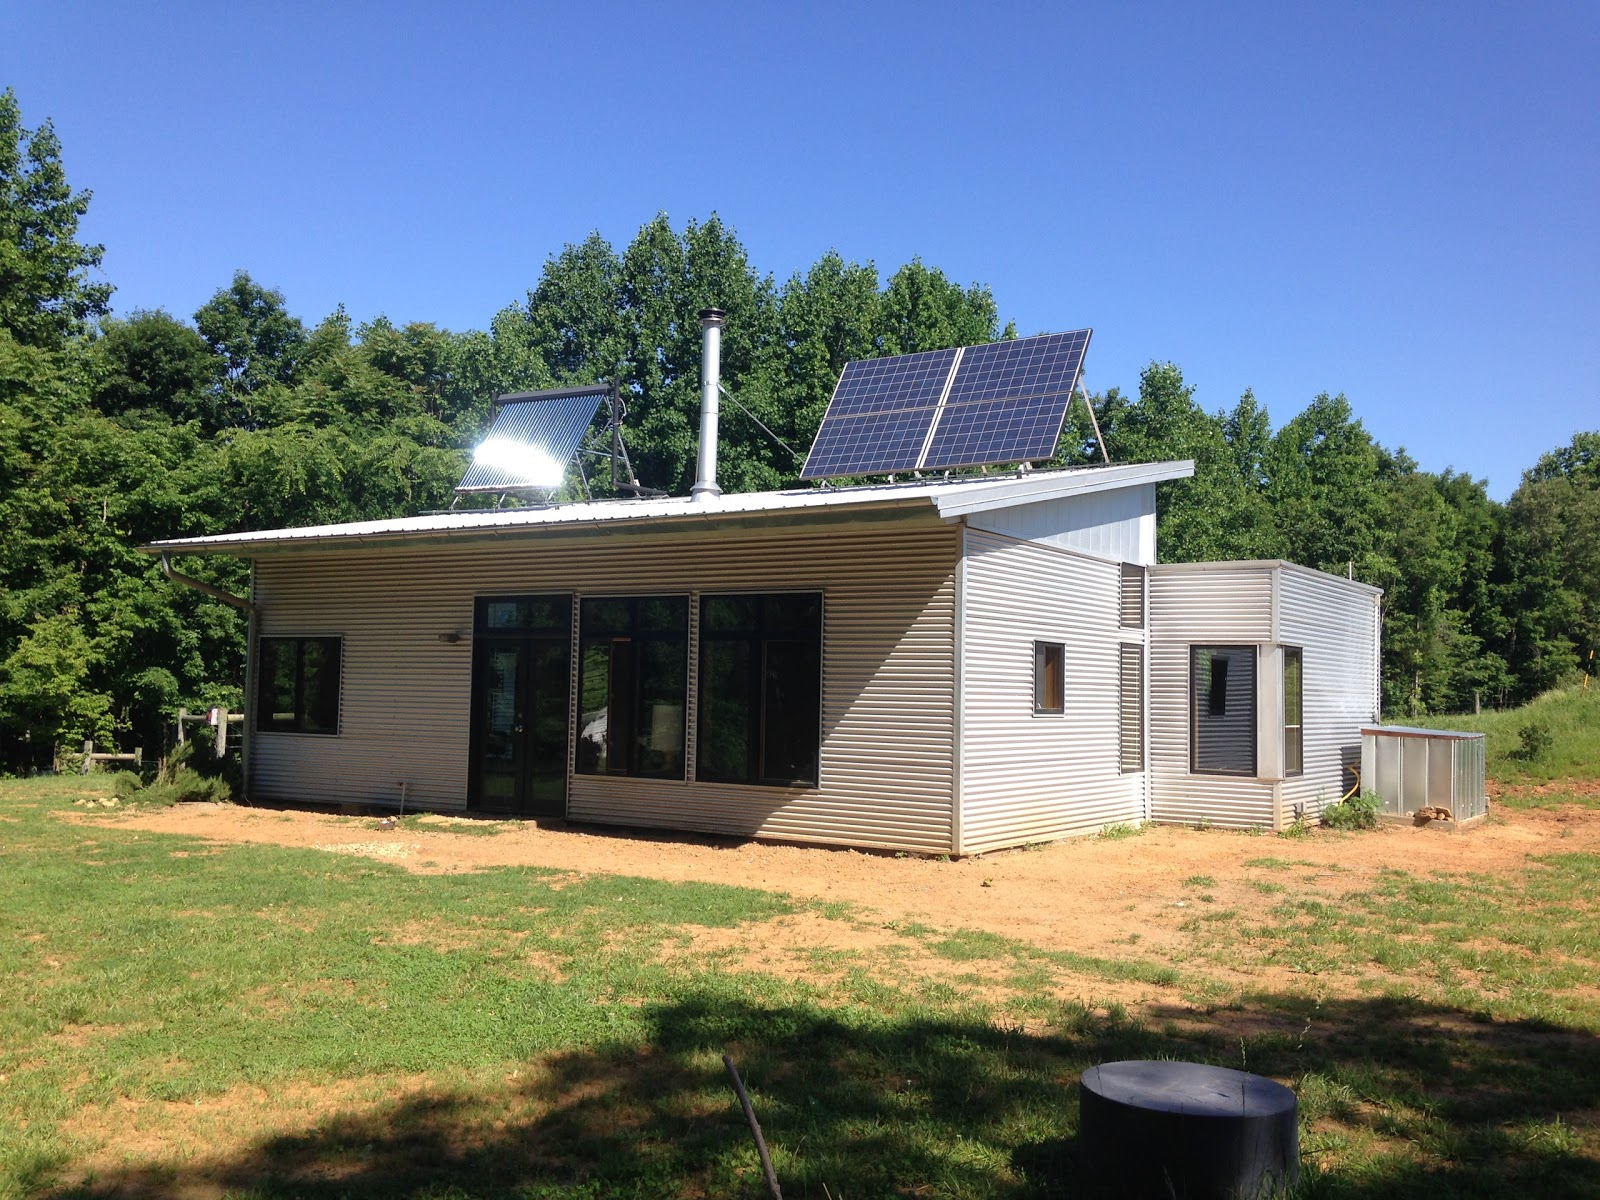 Off Grid Air Conditioning A Modern Prefab House On Minimal ...